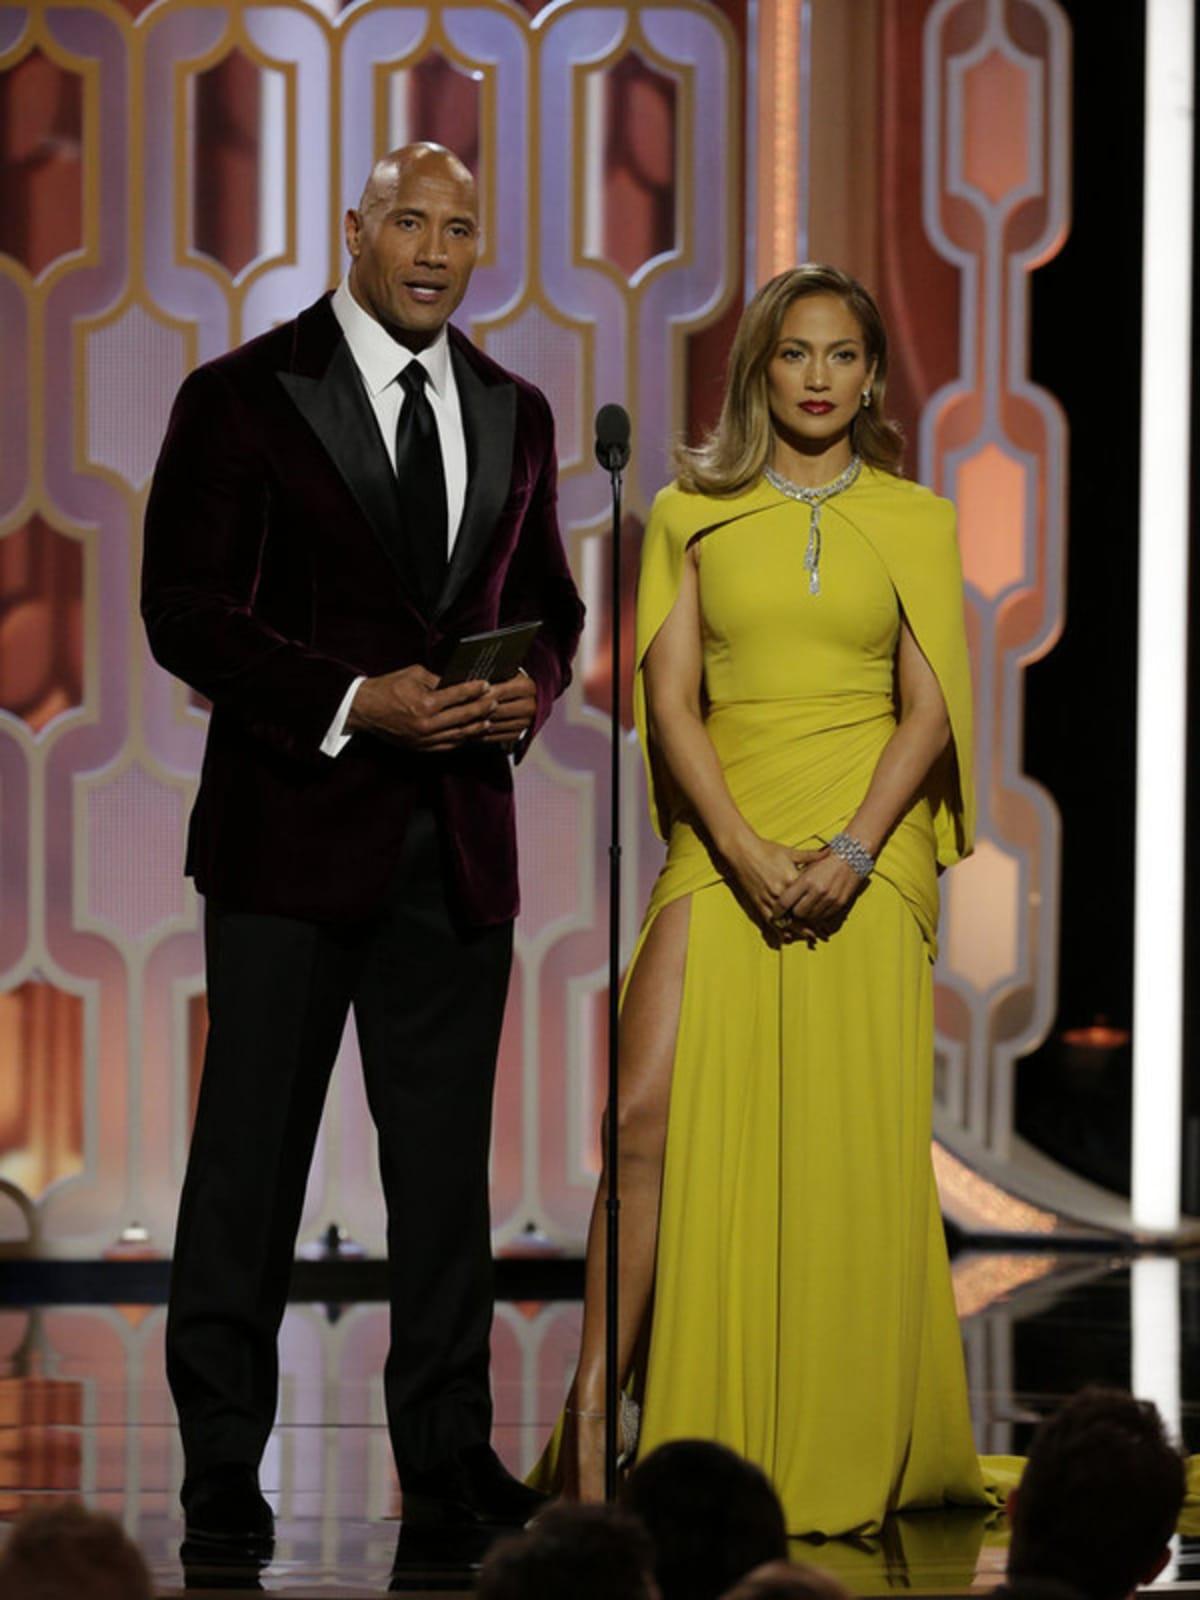 Dwayne Johnson and Jennifer Lopez at Golden Globes